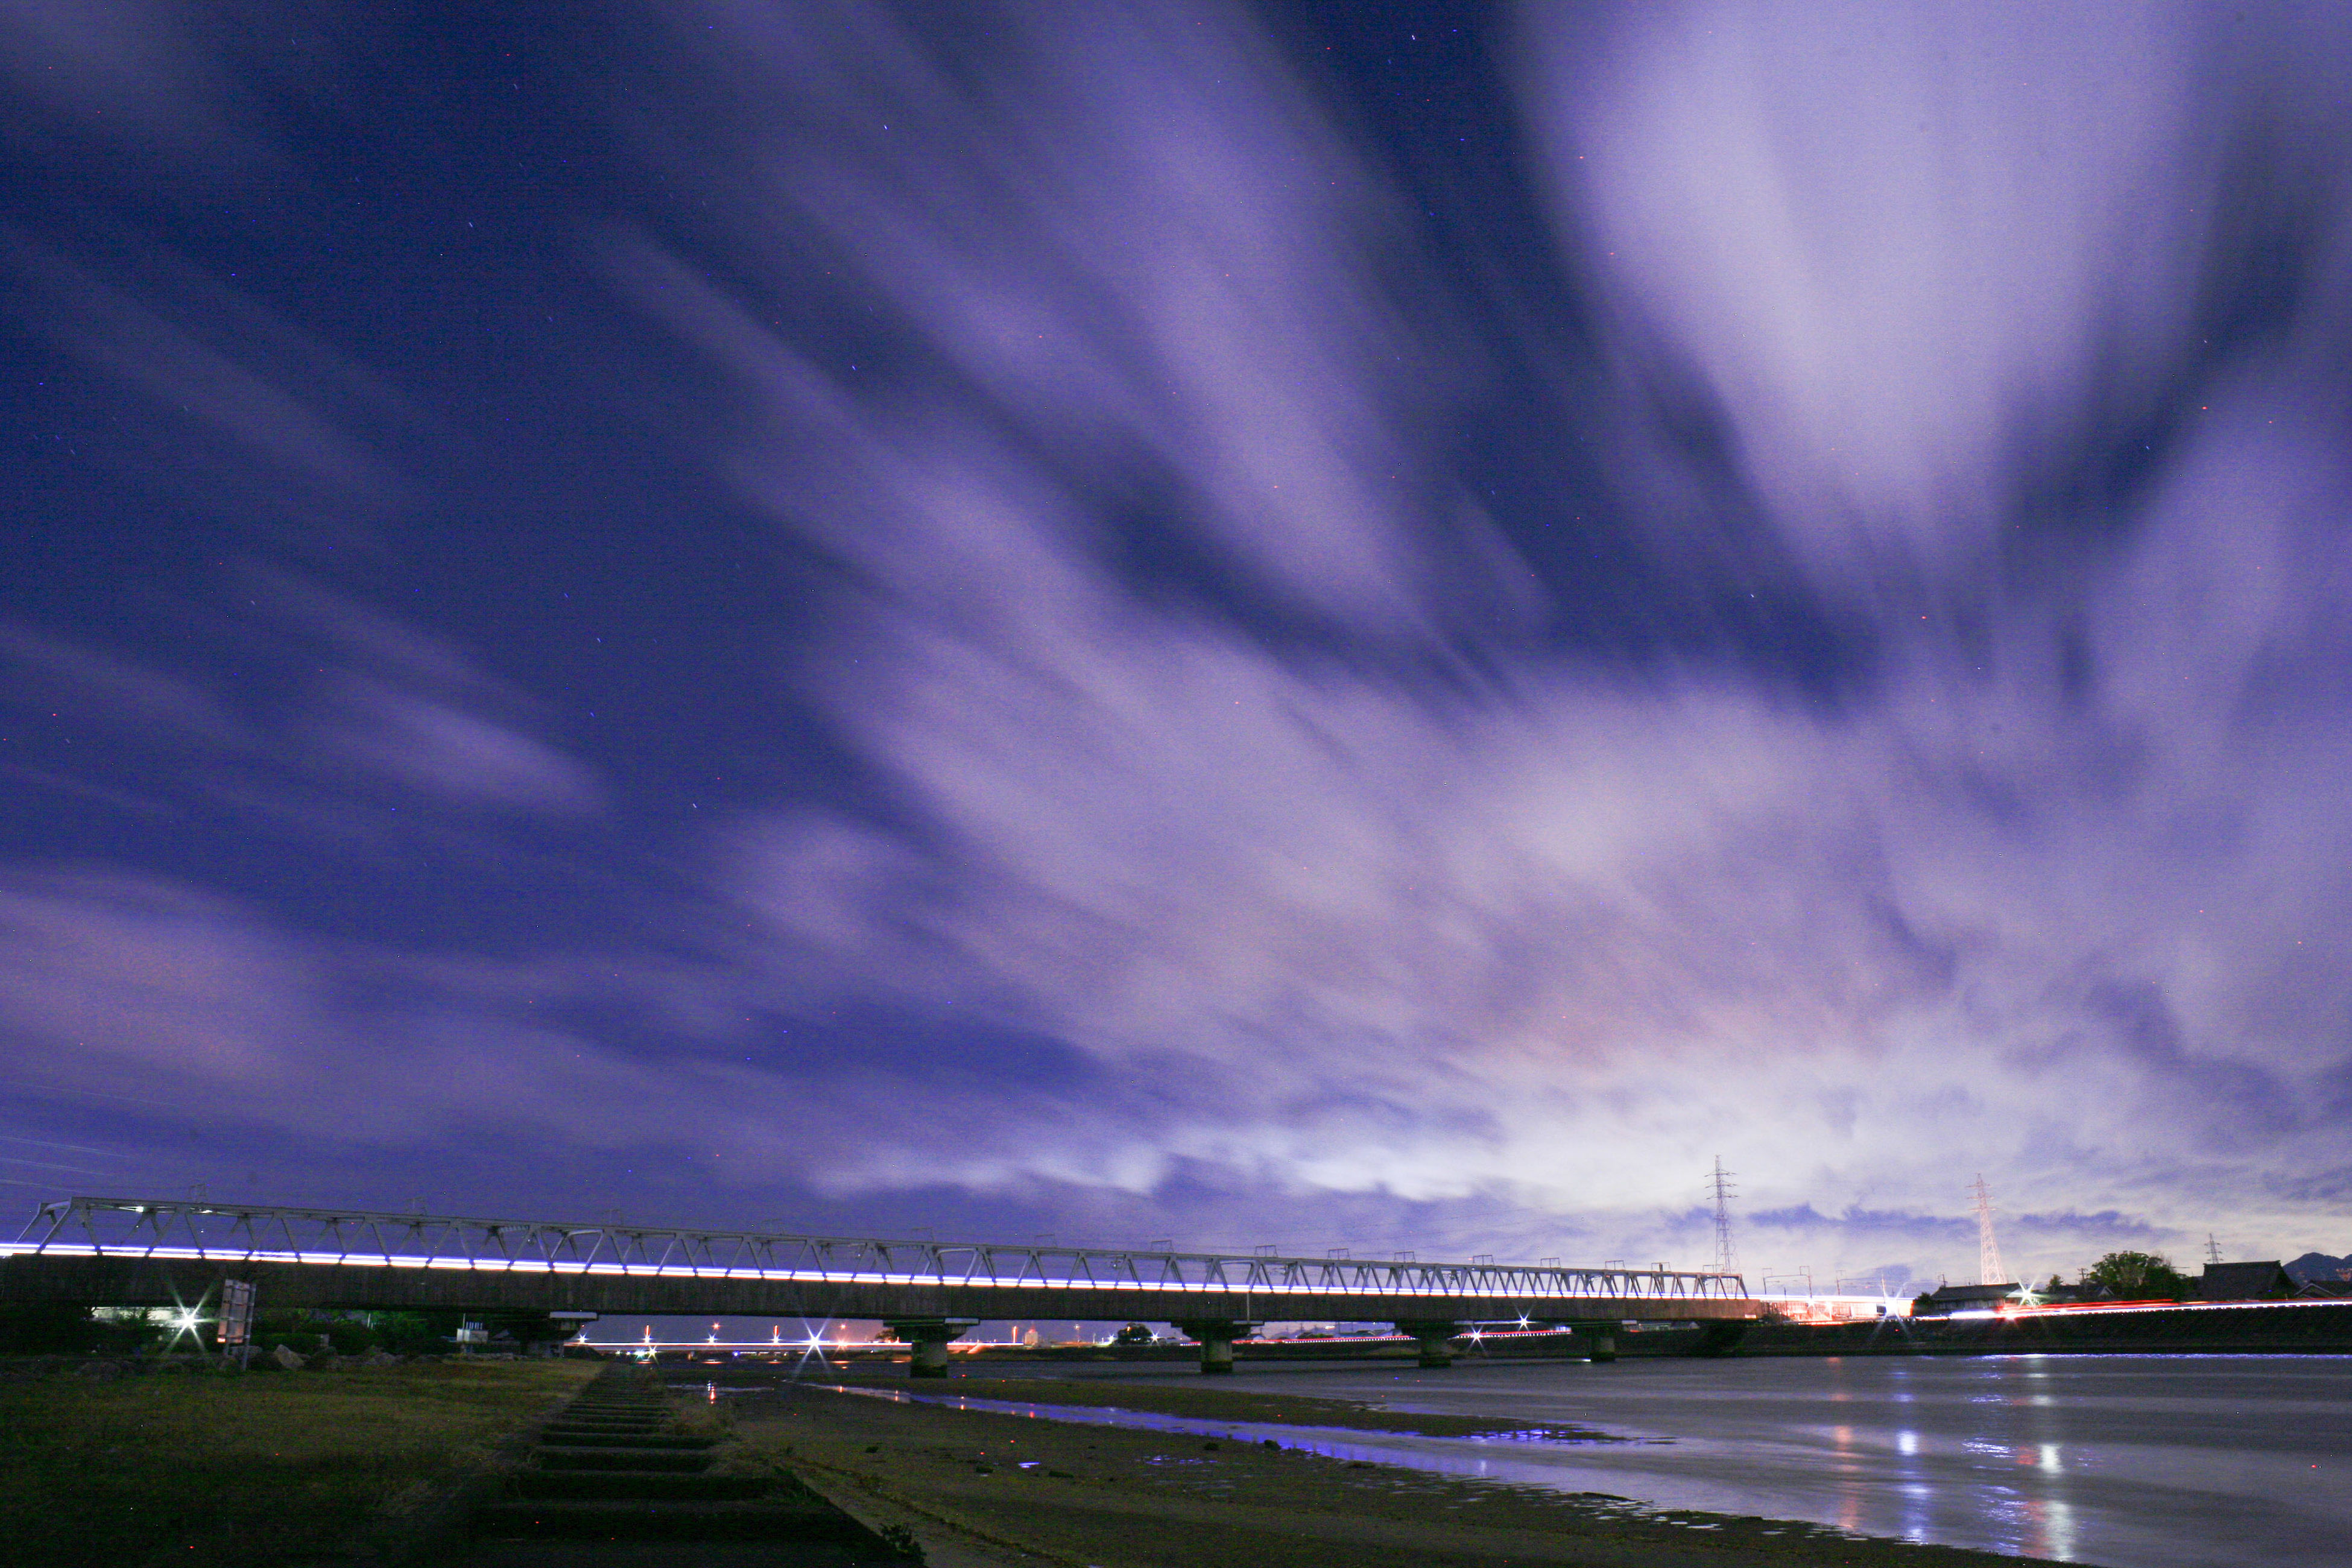 sky, illuminated, connection, night, water, bridge - man made structure, cloud - sky, built structure, transportation, architecture, river, dusk, cloudy, city, nature, bridge, outdoors, sea, long exposure, dramatic sky